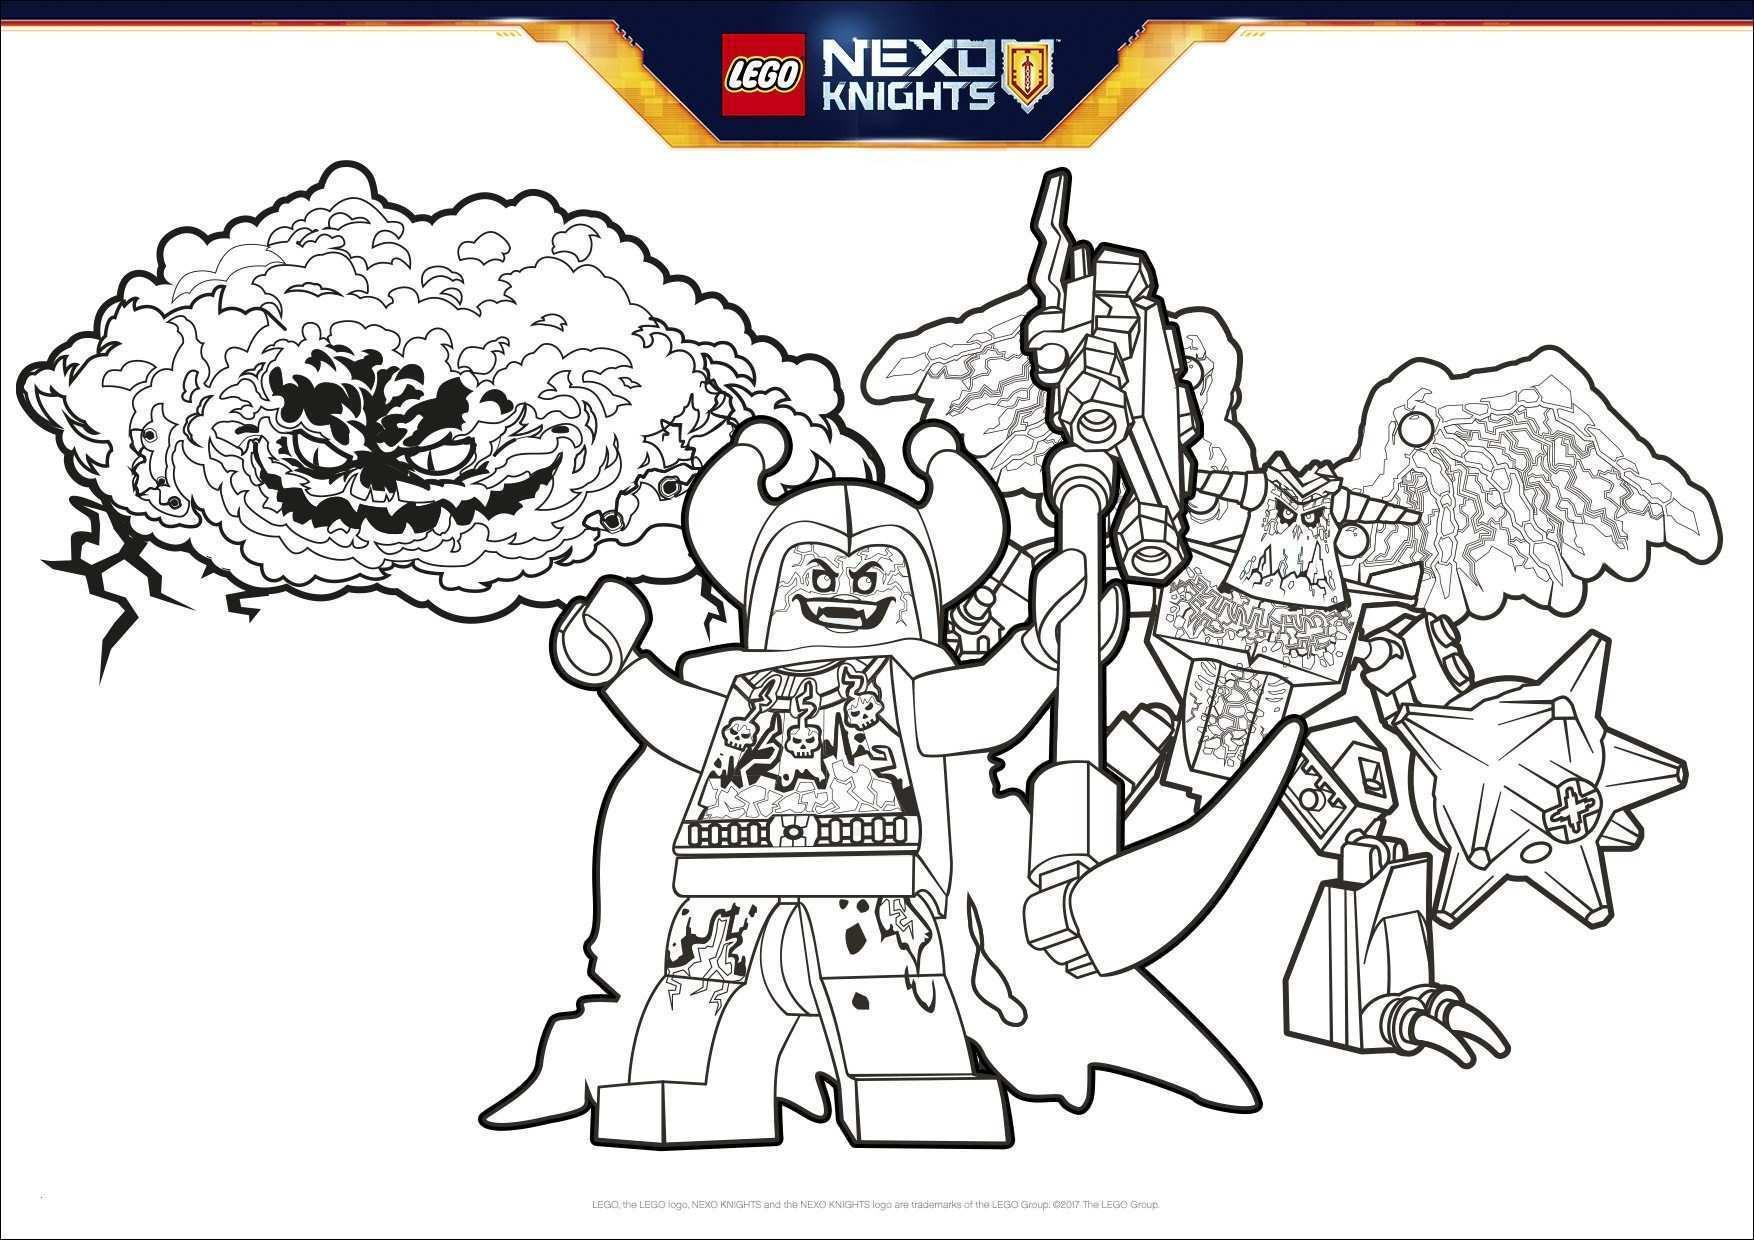 Ausmalbild Nexo Knights Einzigartig Lego Nexo Knights Ausmalbilder Gratis Abbild Nexo Knight Coloring Fotos